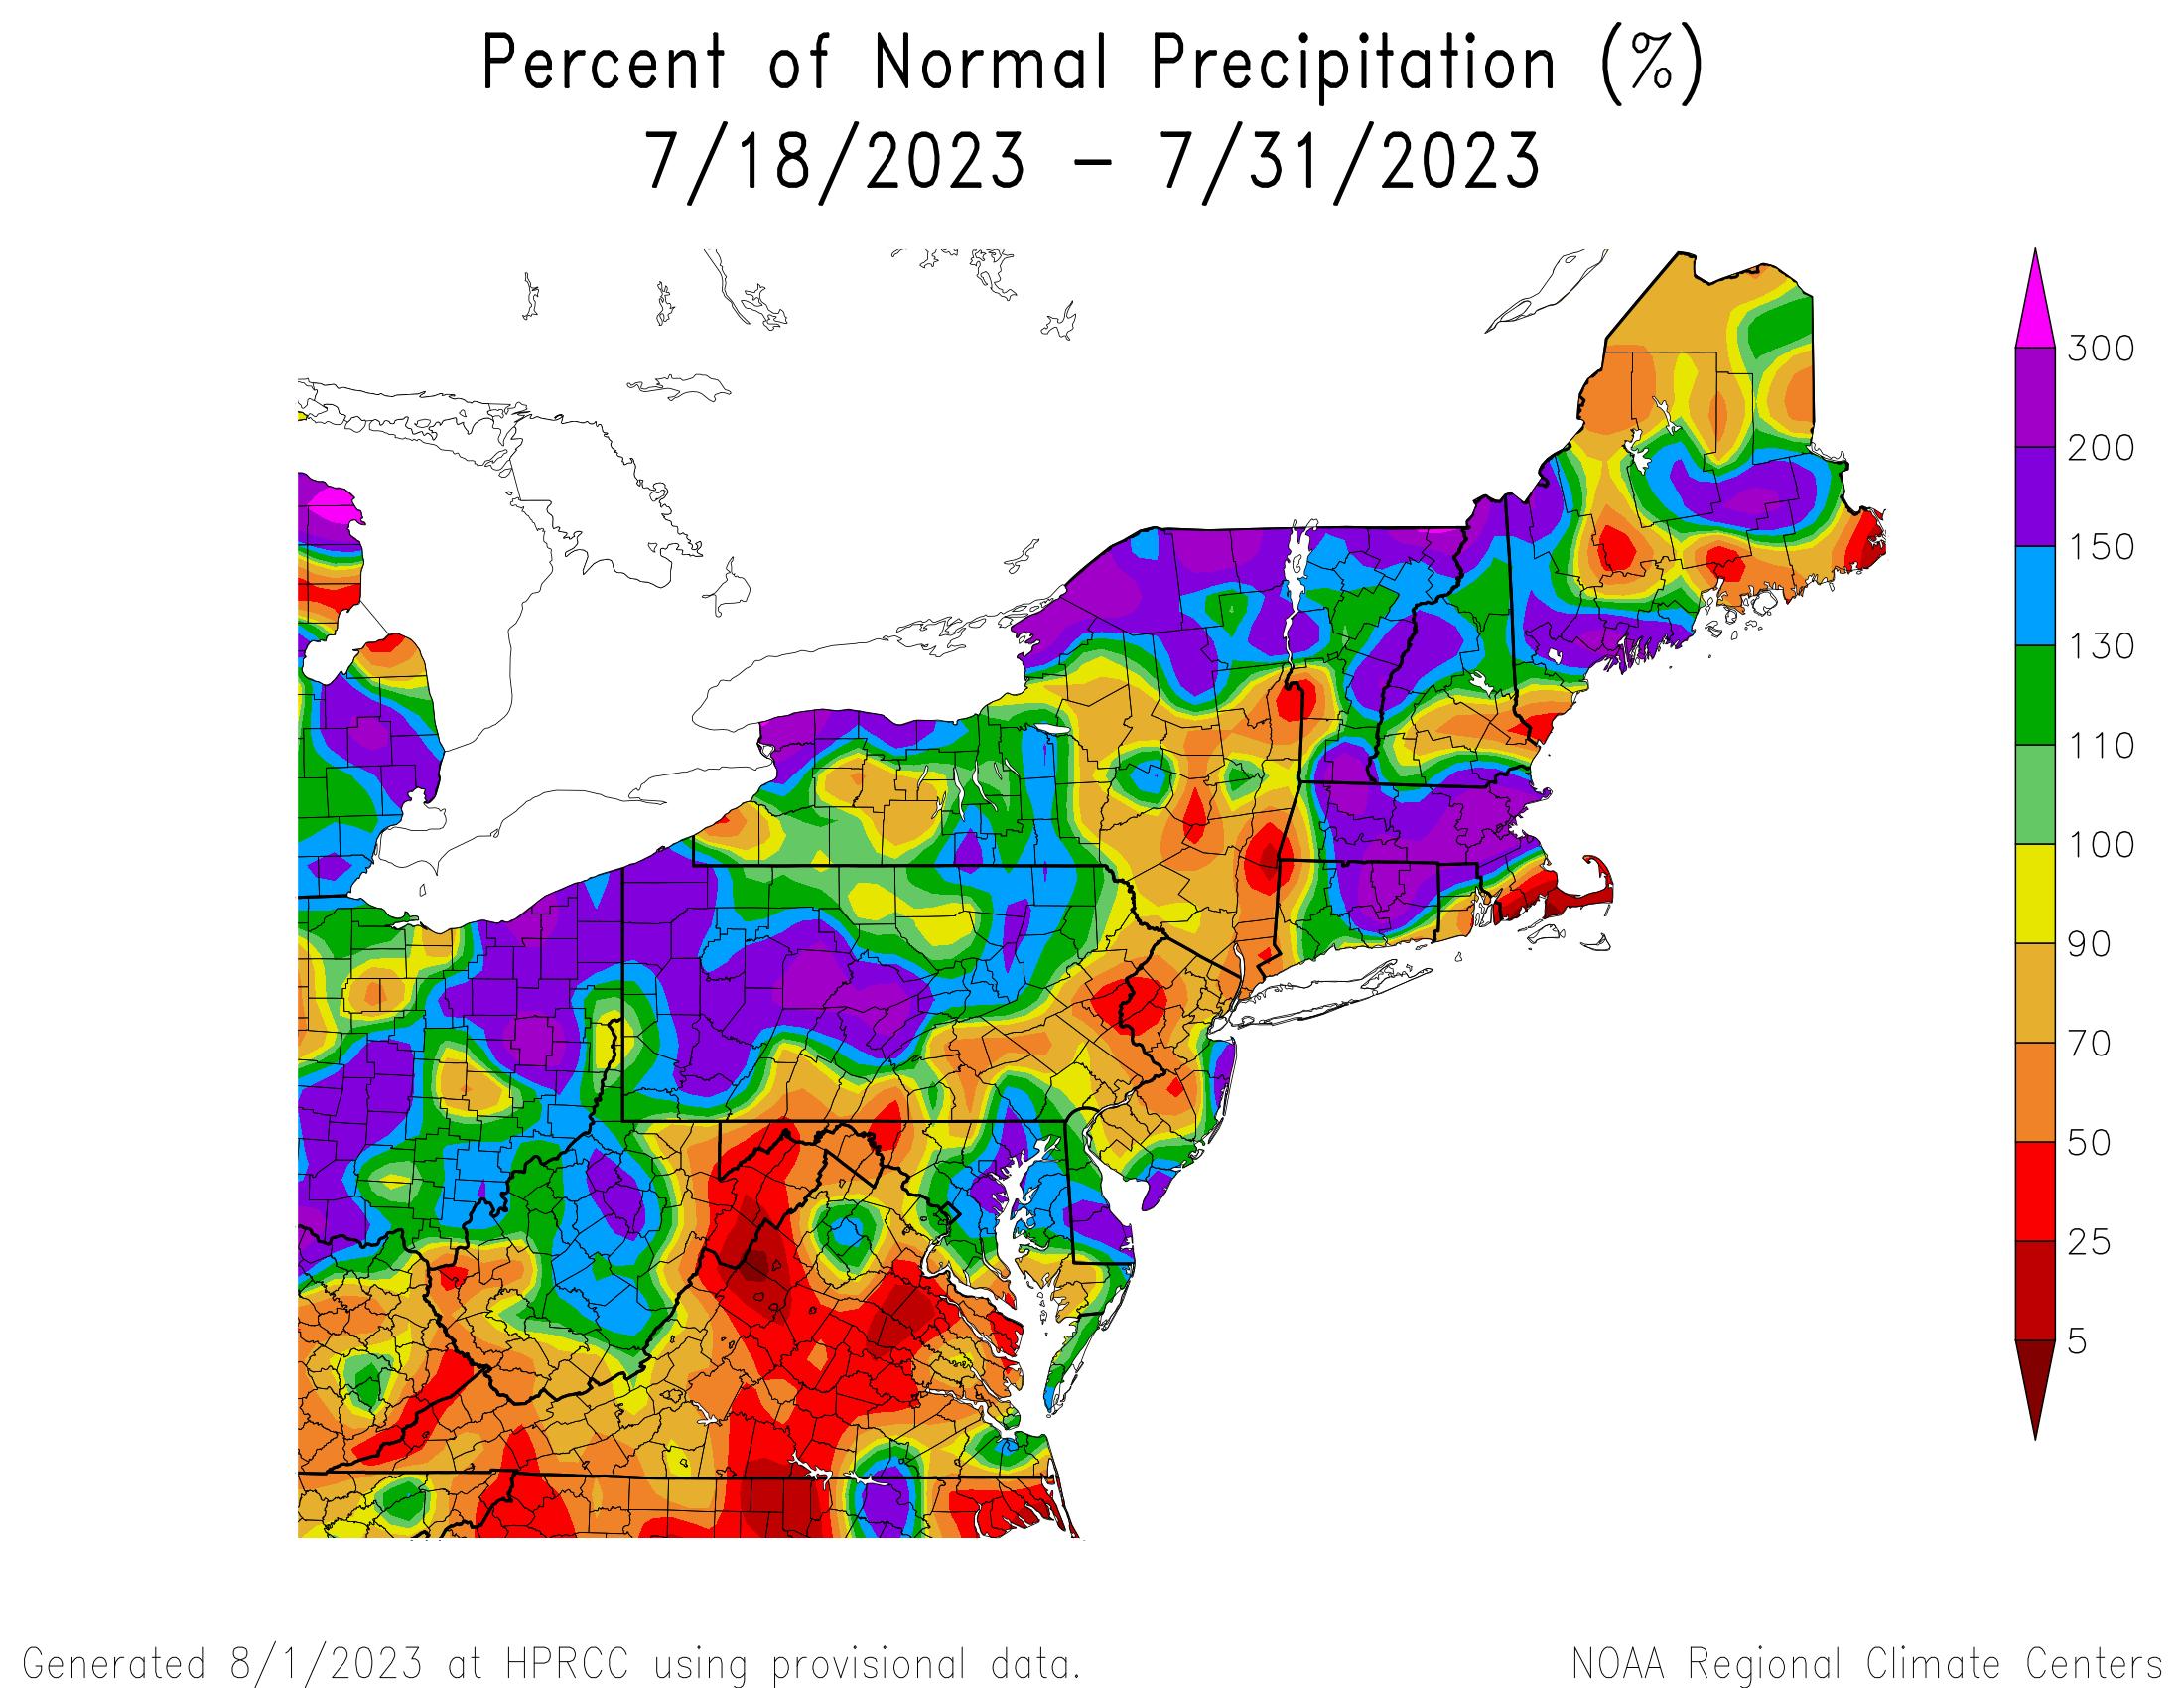 14-Day Precipitation - Percentage of Normal